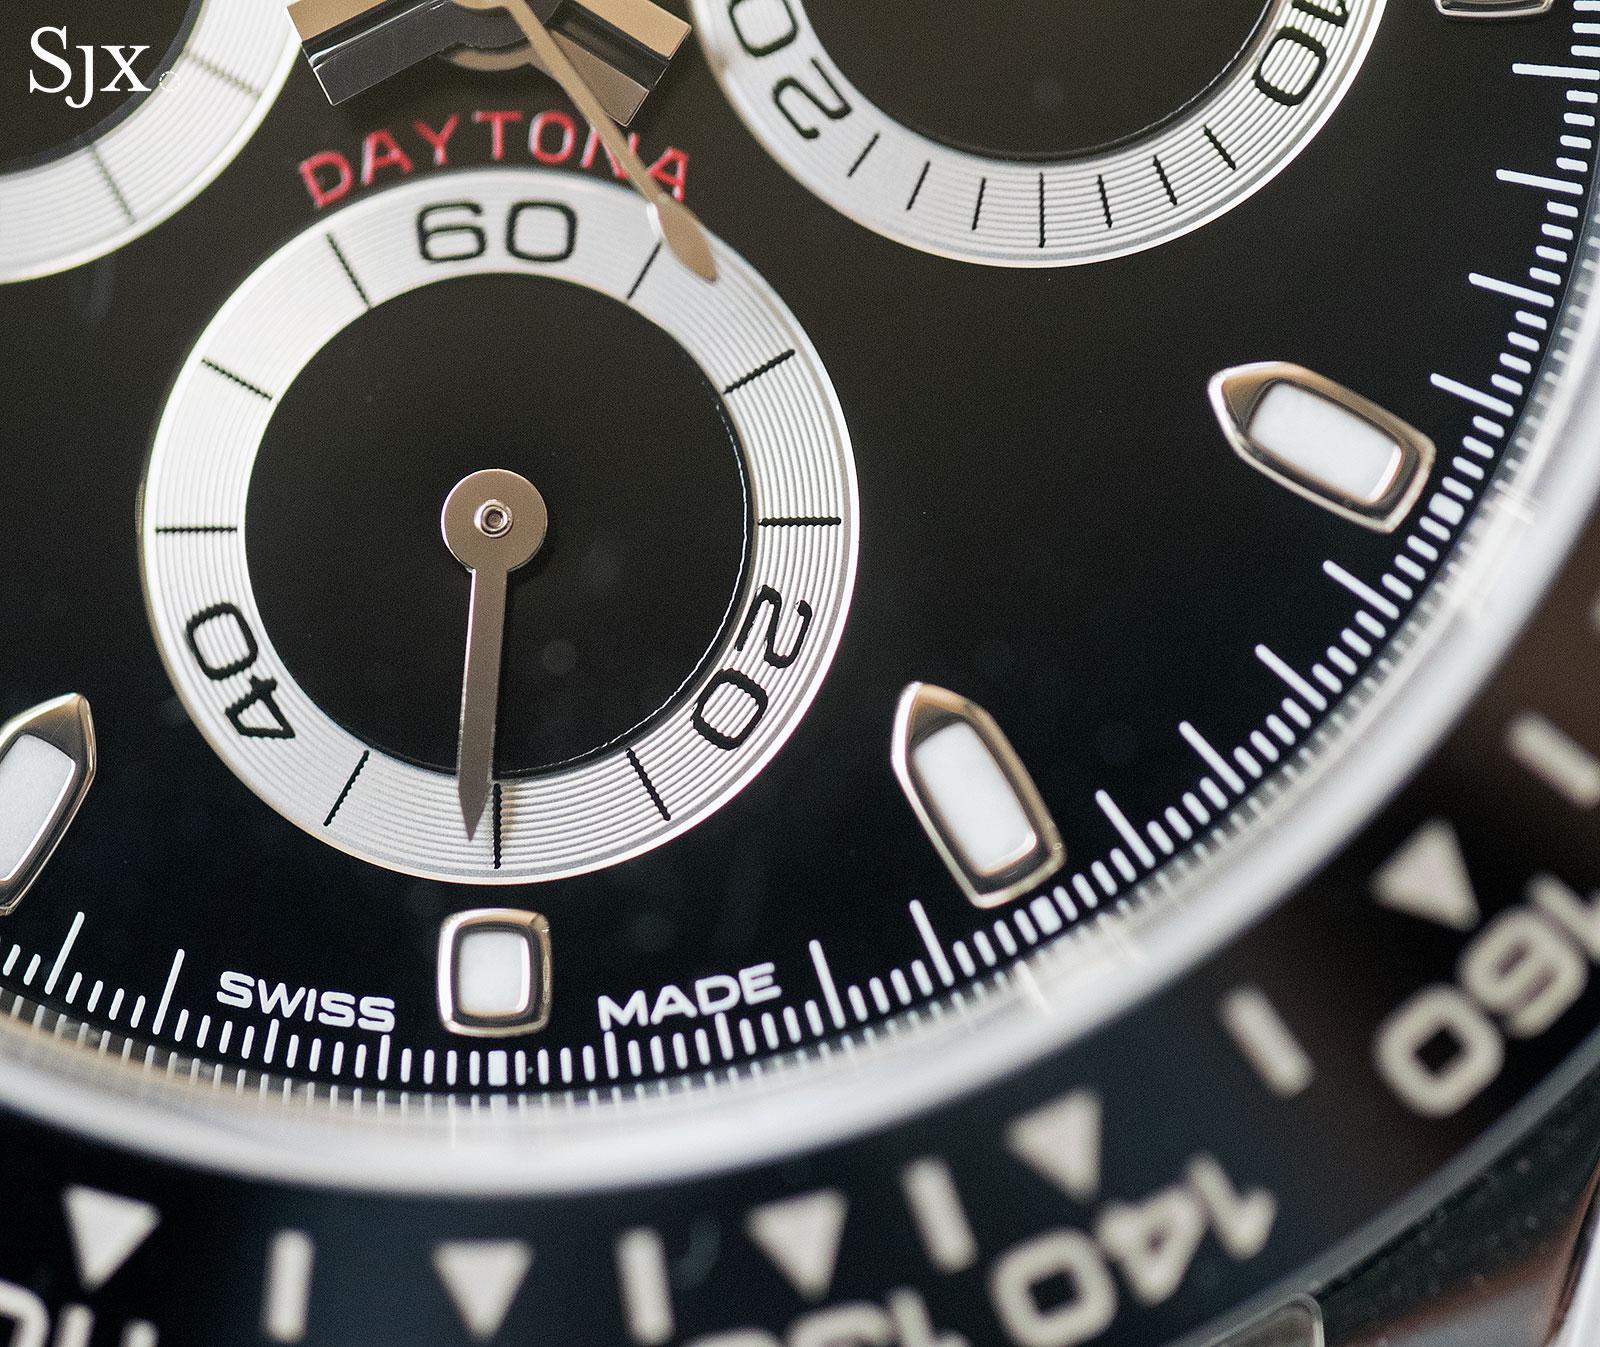 Rolex Daytona Ceramic Black Dial 116500LN - 2